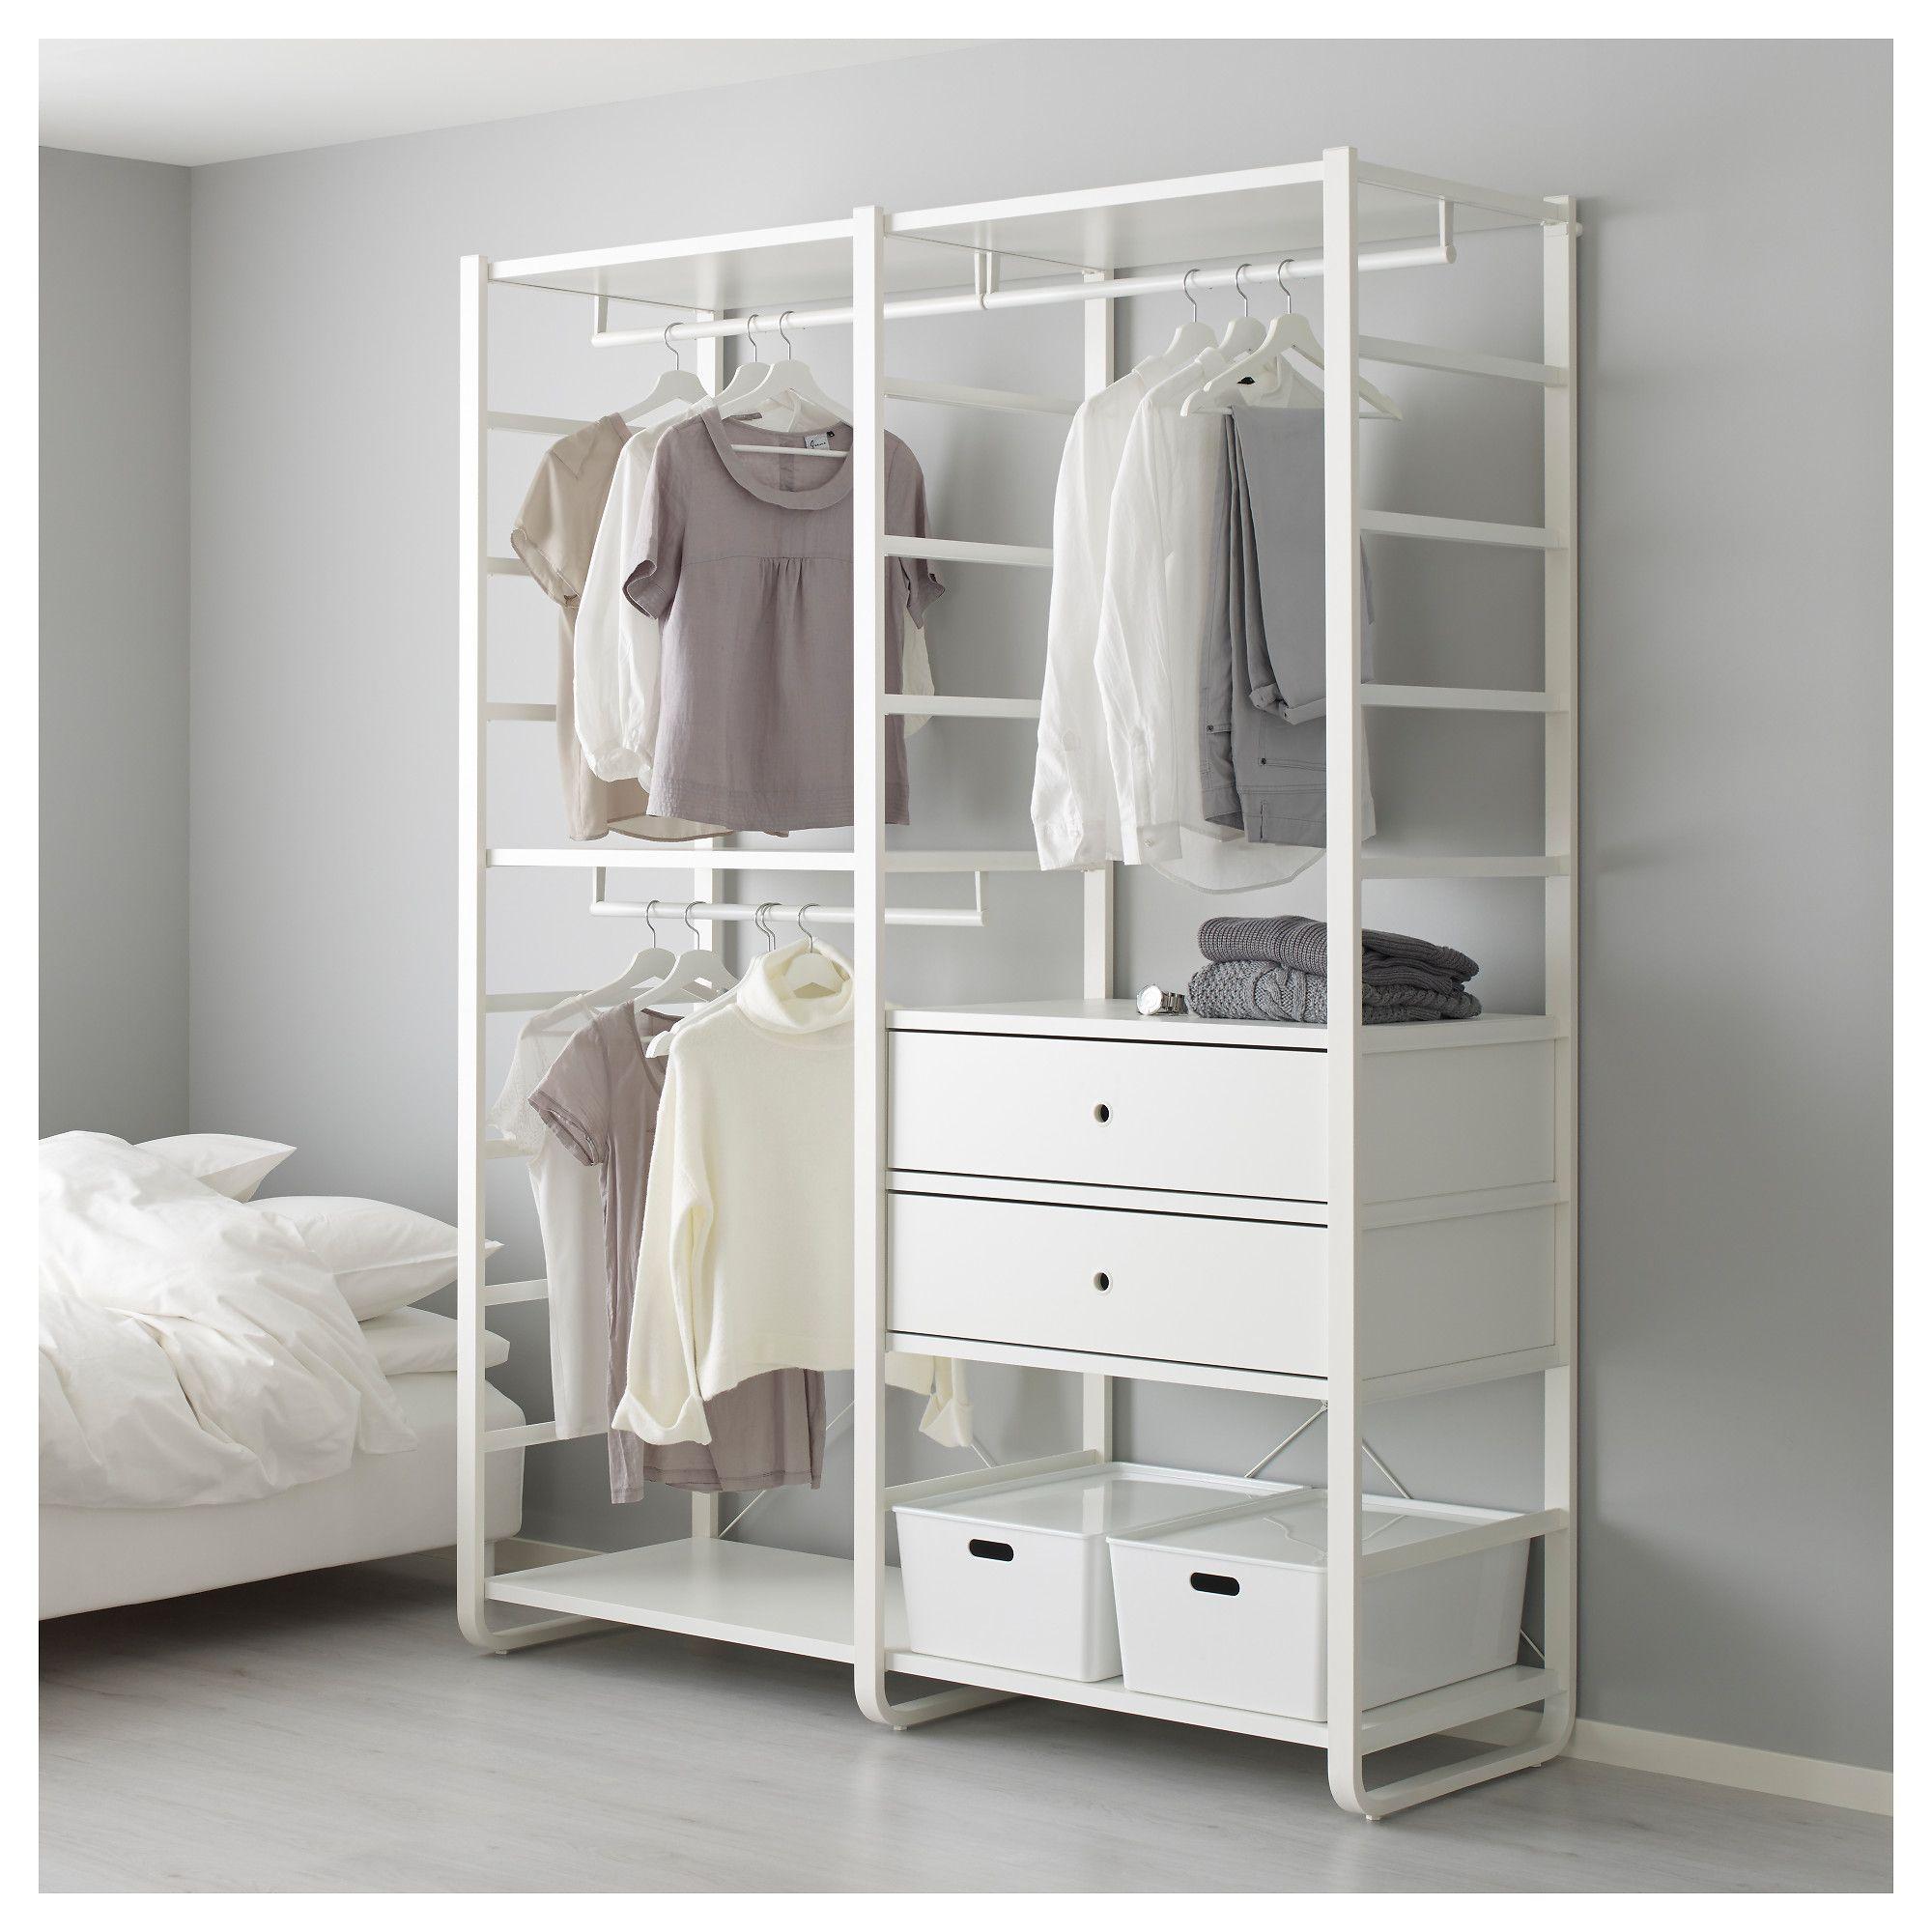 Elvarli 2 Section Shelving Unit White Width 64 7 8 Height 85 Order Today Ikea Clothing Rack Bedroom Shelving Unit Shelving